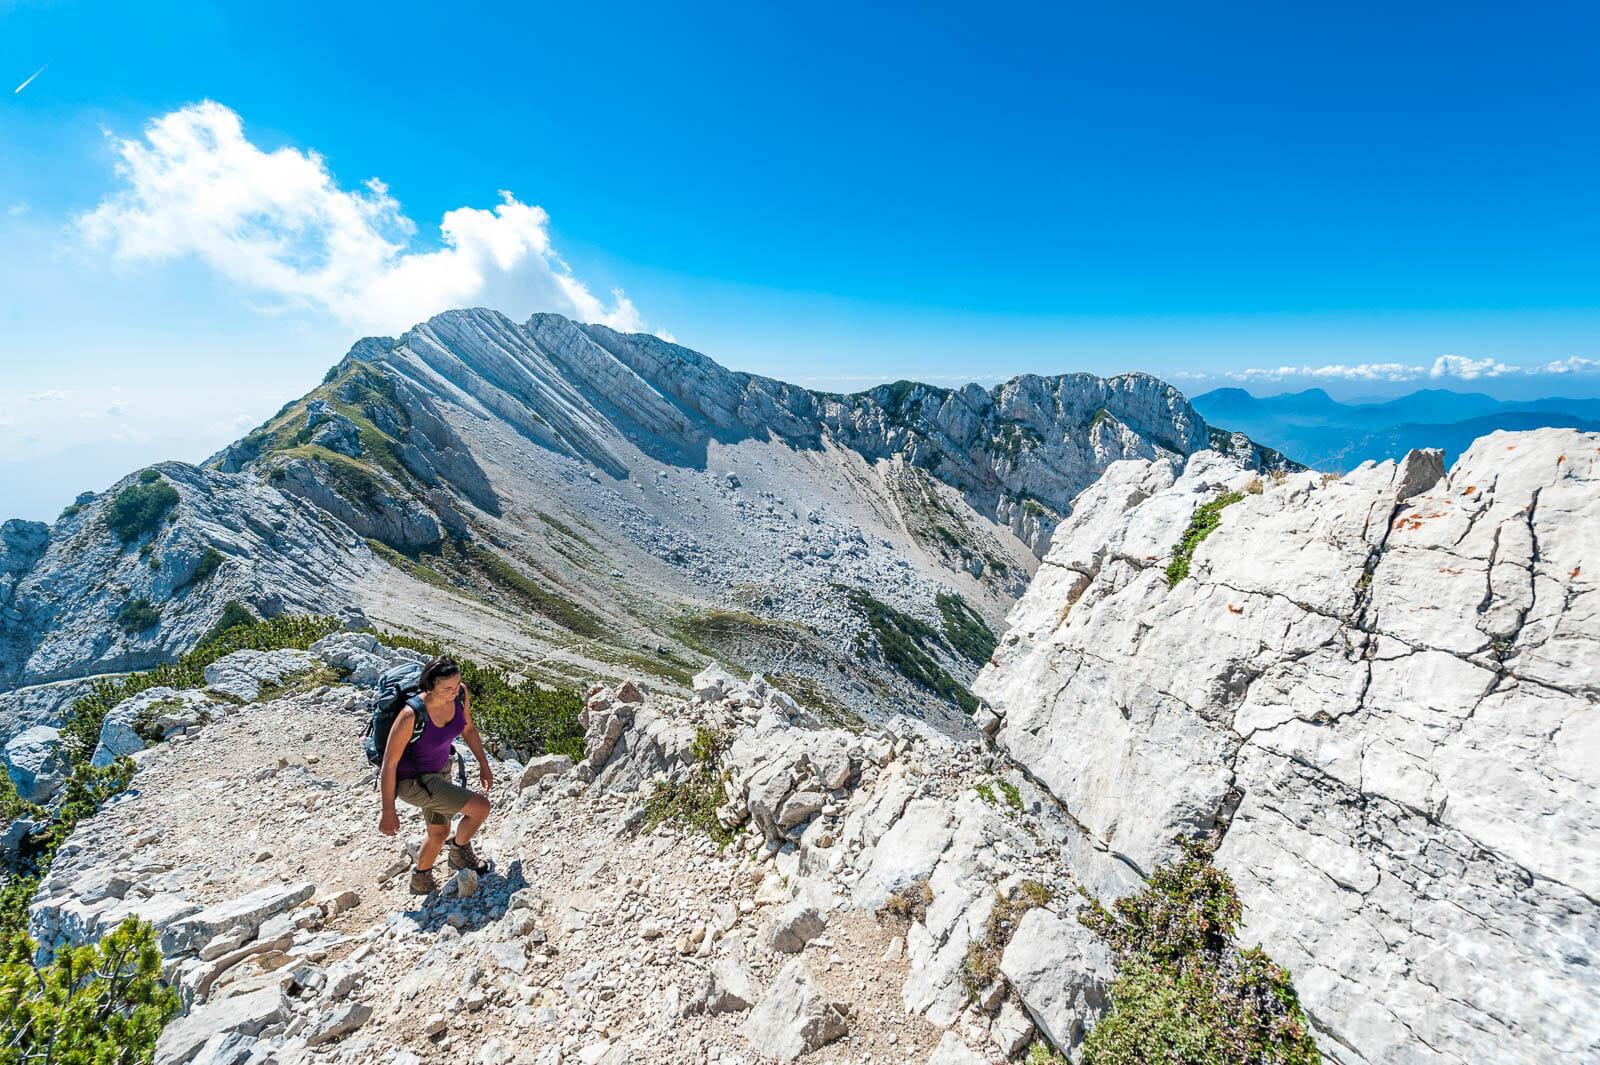 monte baldo peaks trekking route to cima valdritta